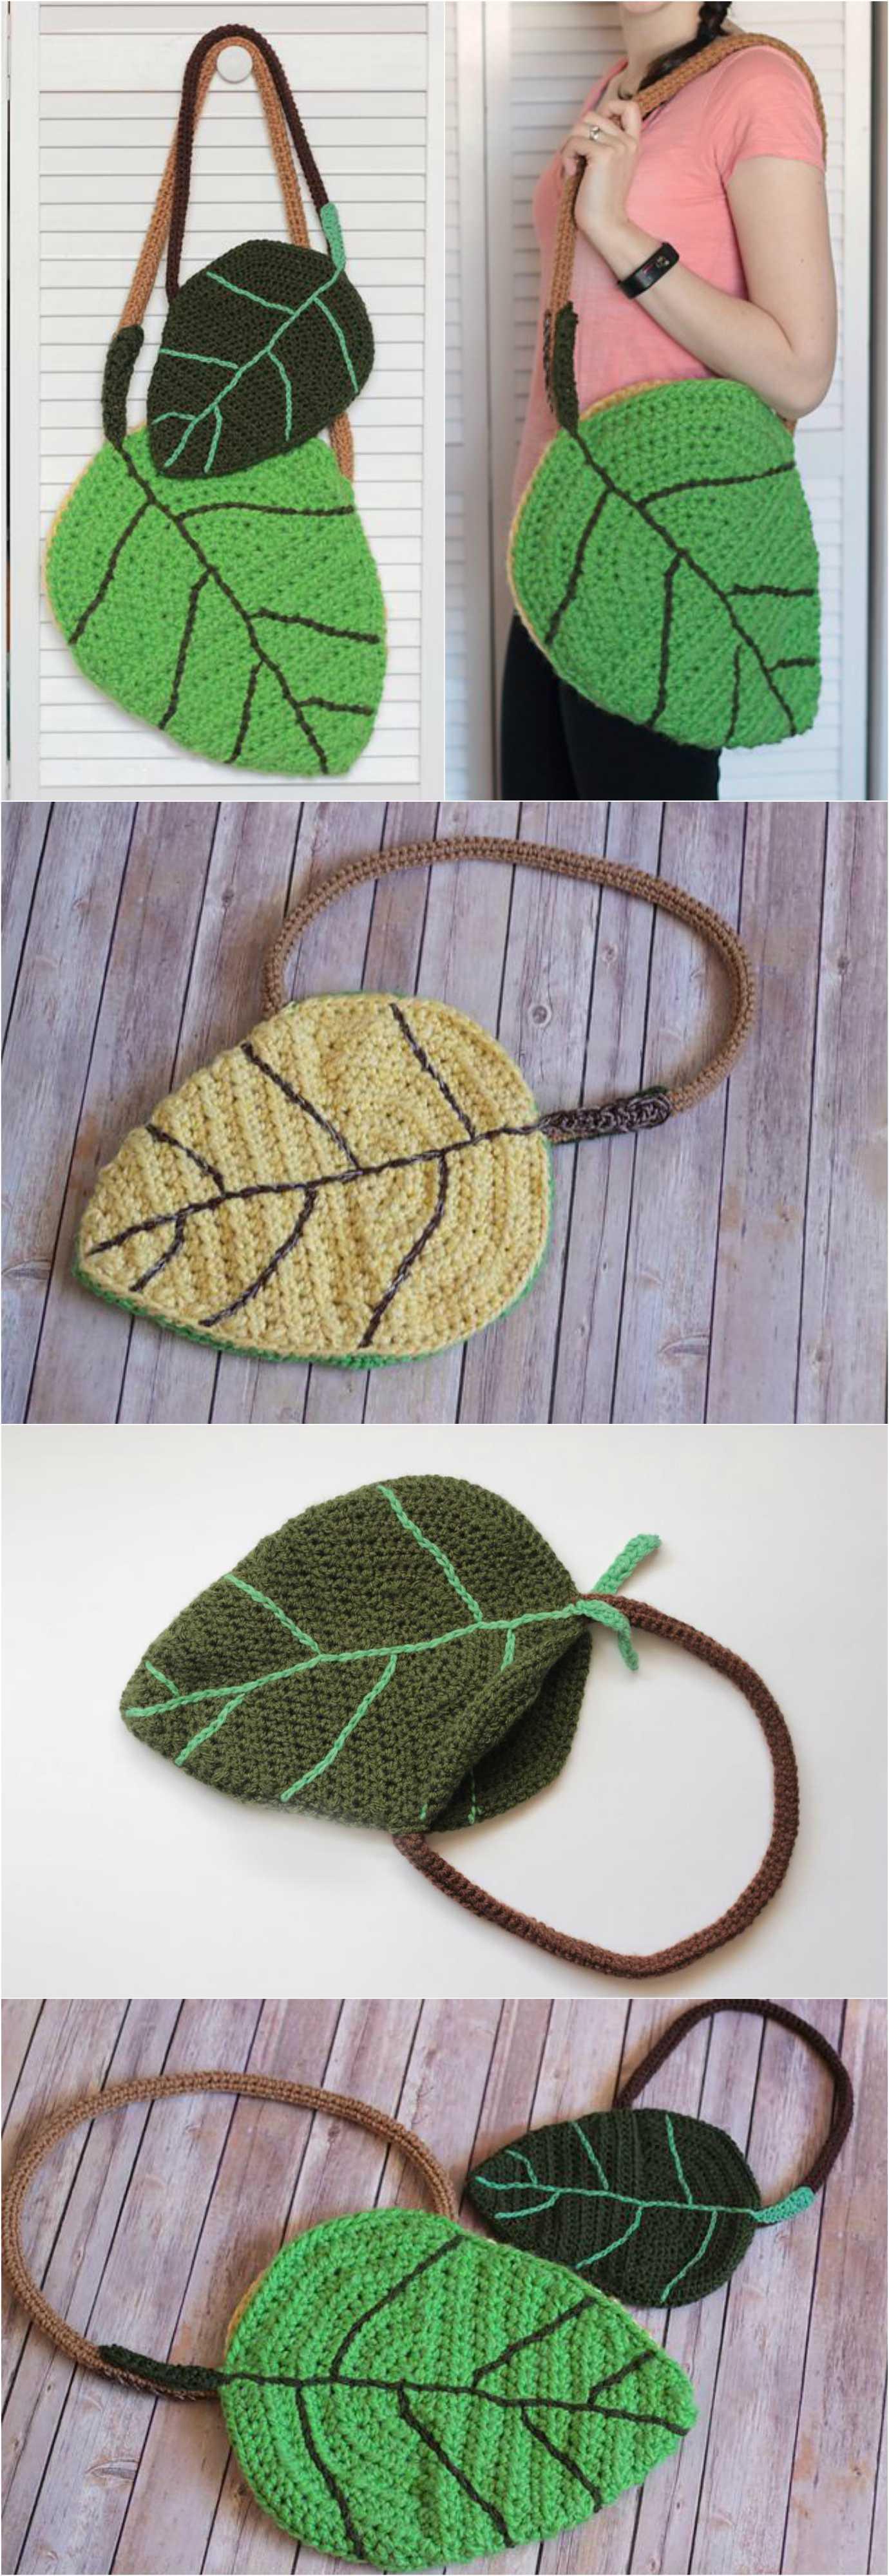 Crochet Leaf Bag